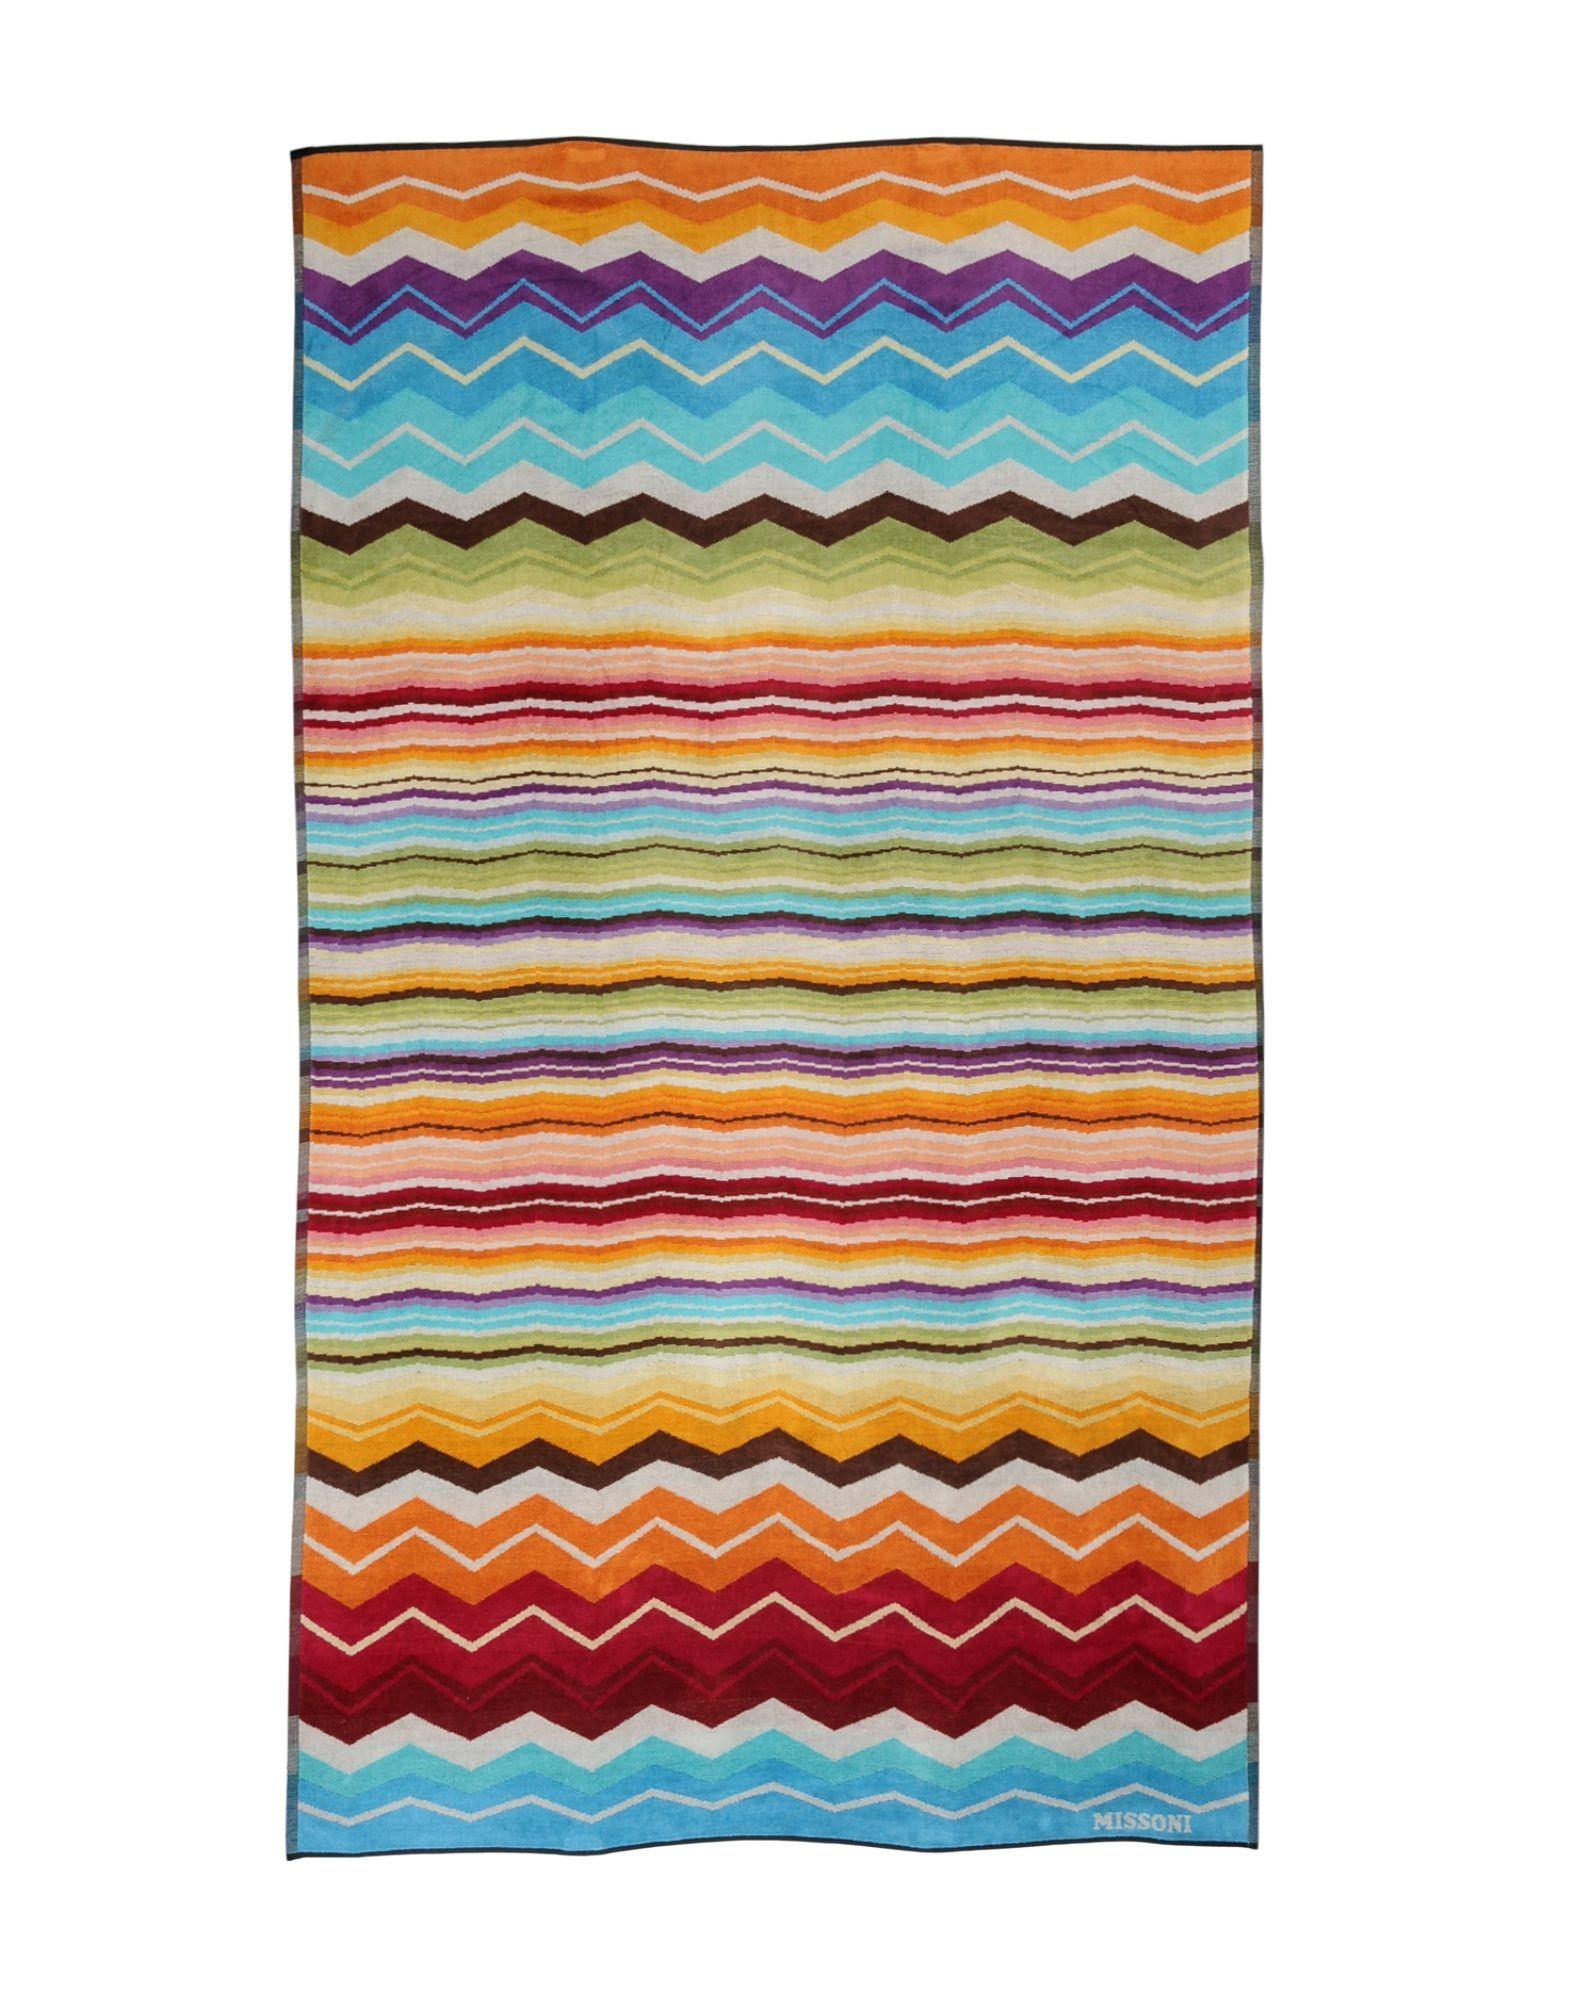 beach towel missoni home  beach towels missoni home on missoni  - beach towel missoni home  beach towels missoni home on missoni online store